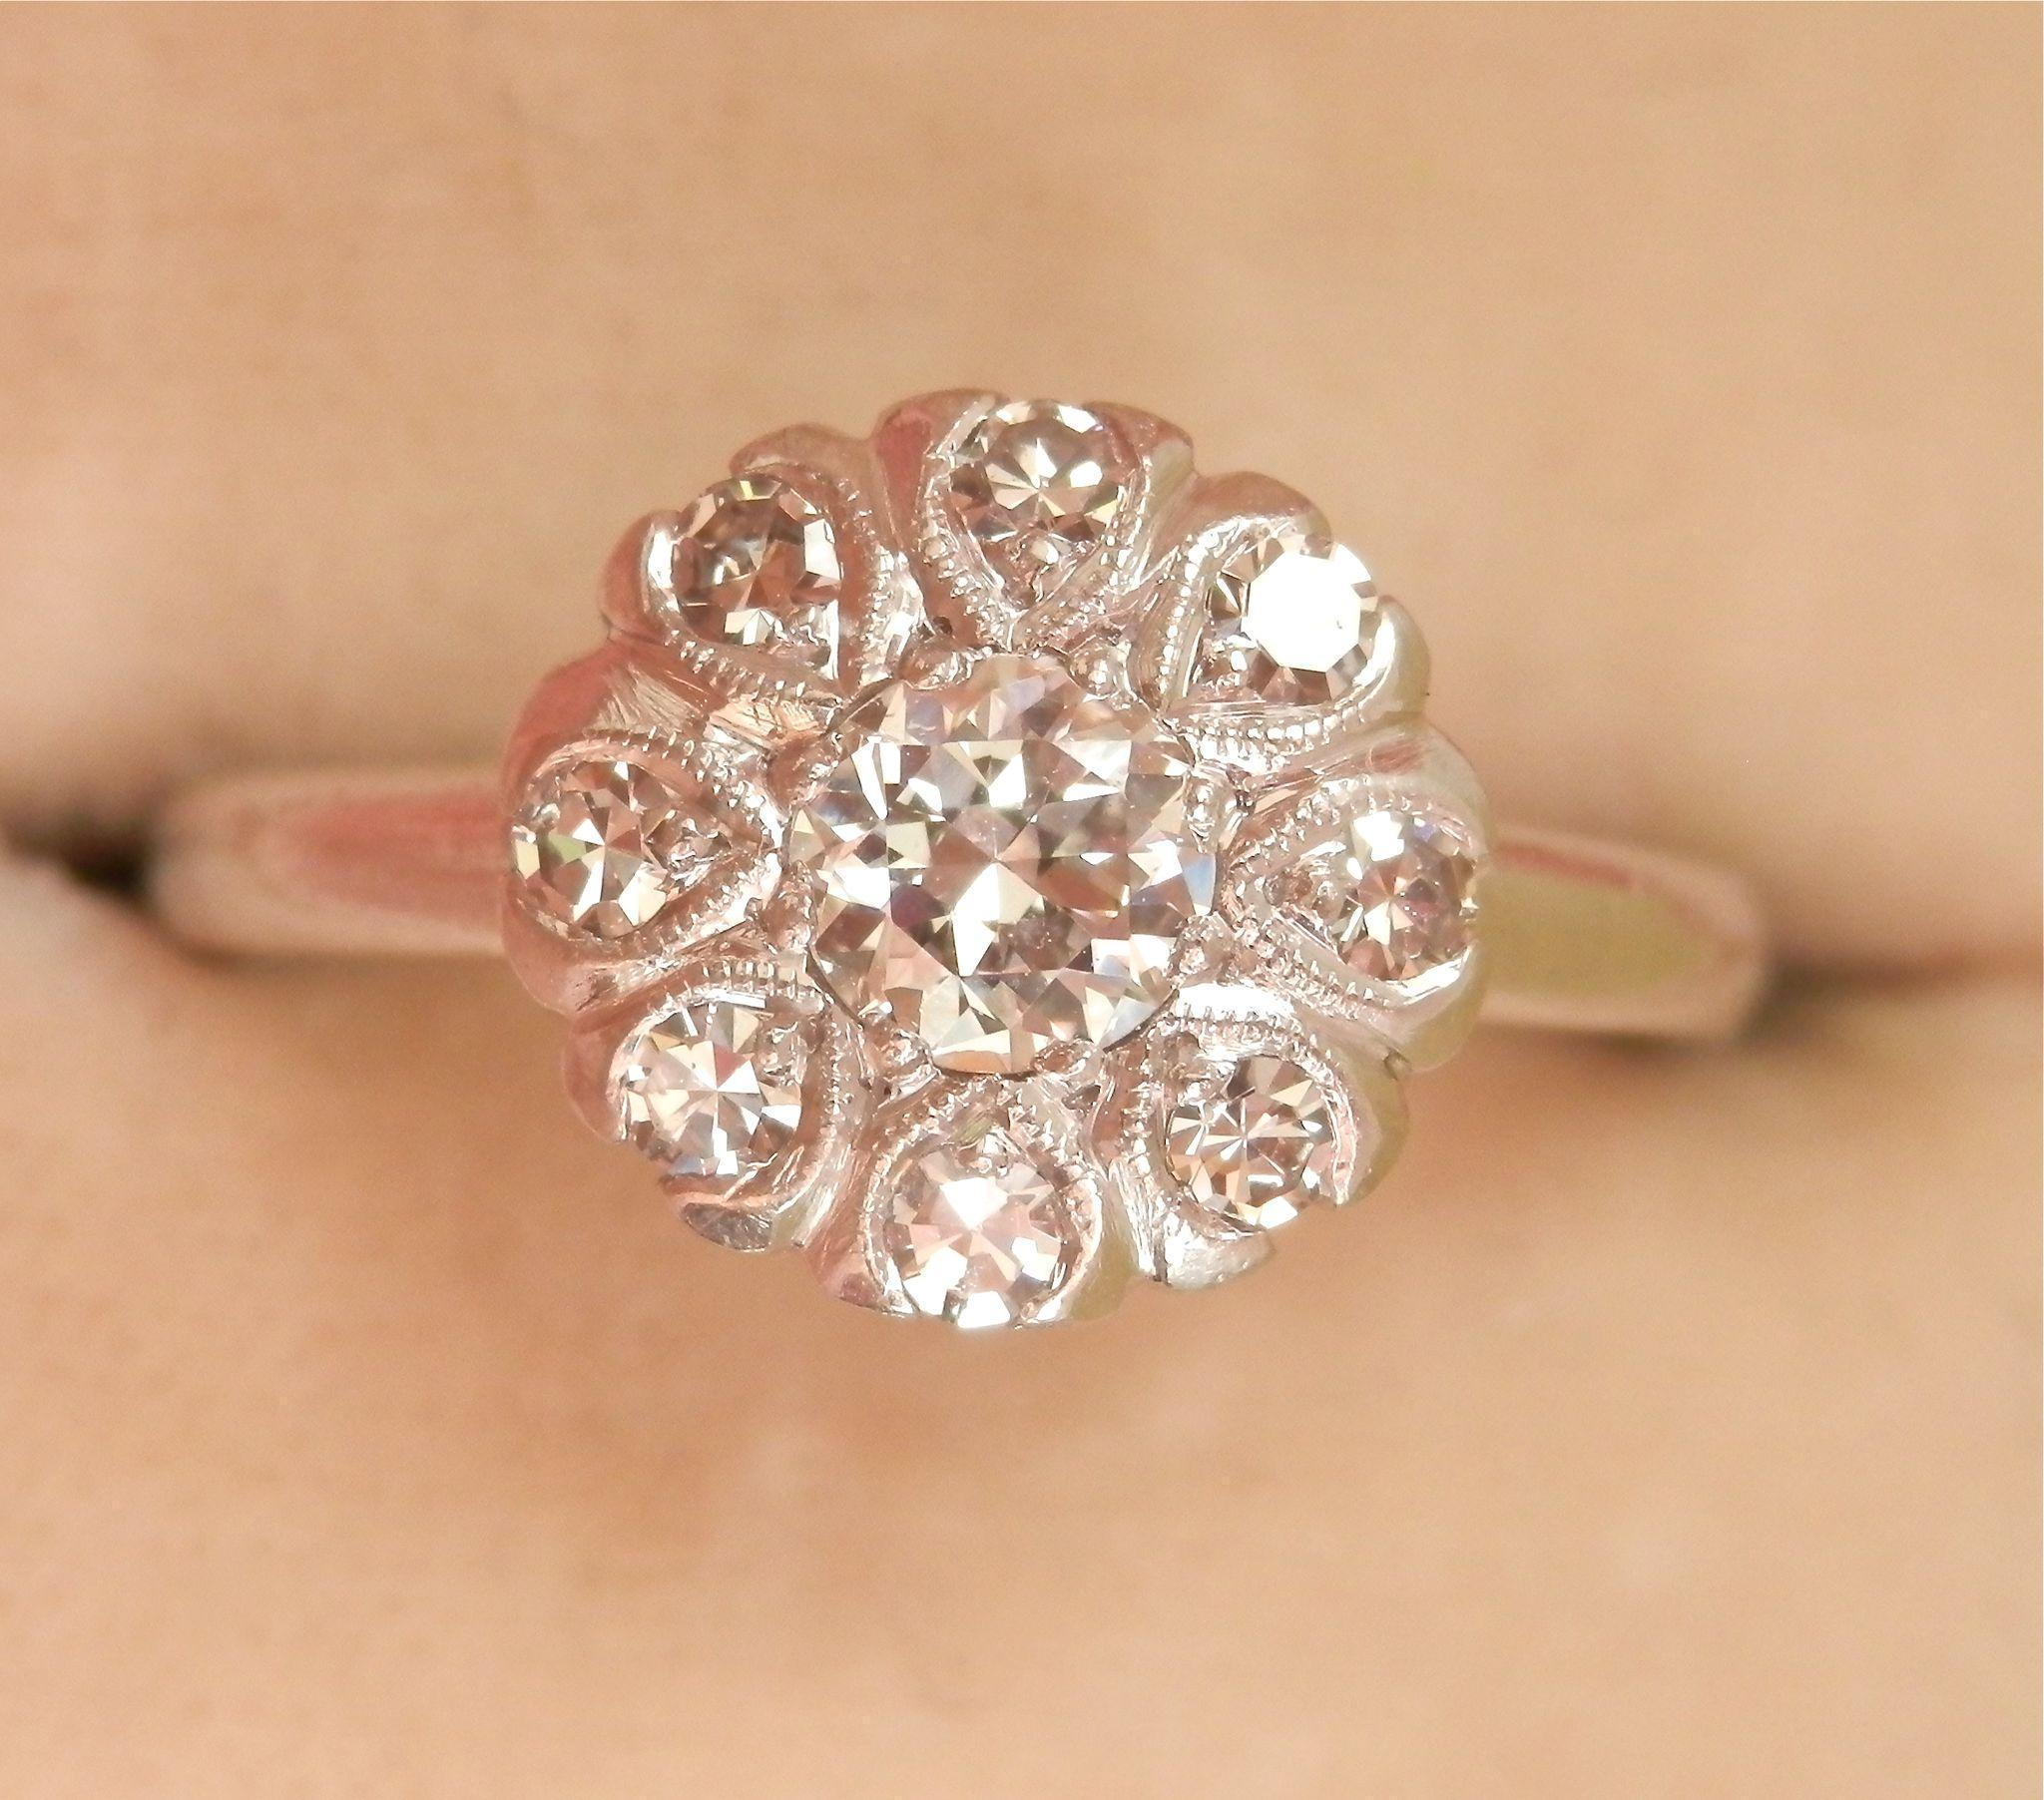 Twinkling Art Deco 0.55 ct. Diamond Cluster Platinum Ring